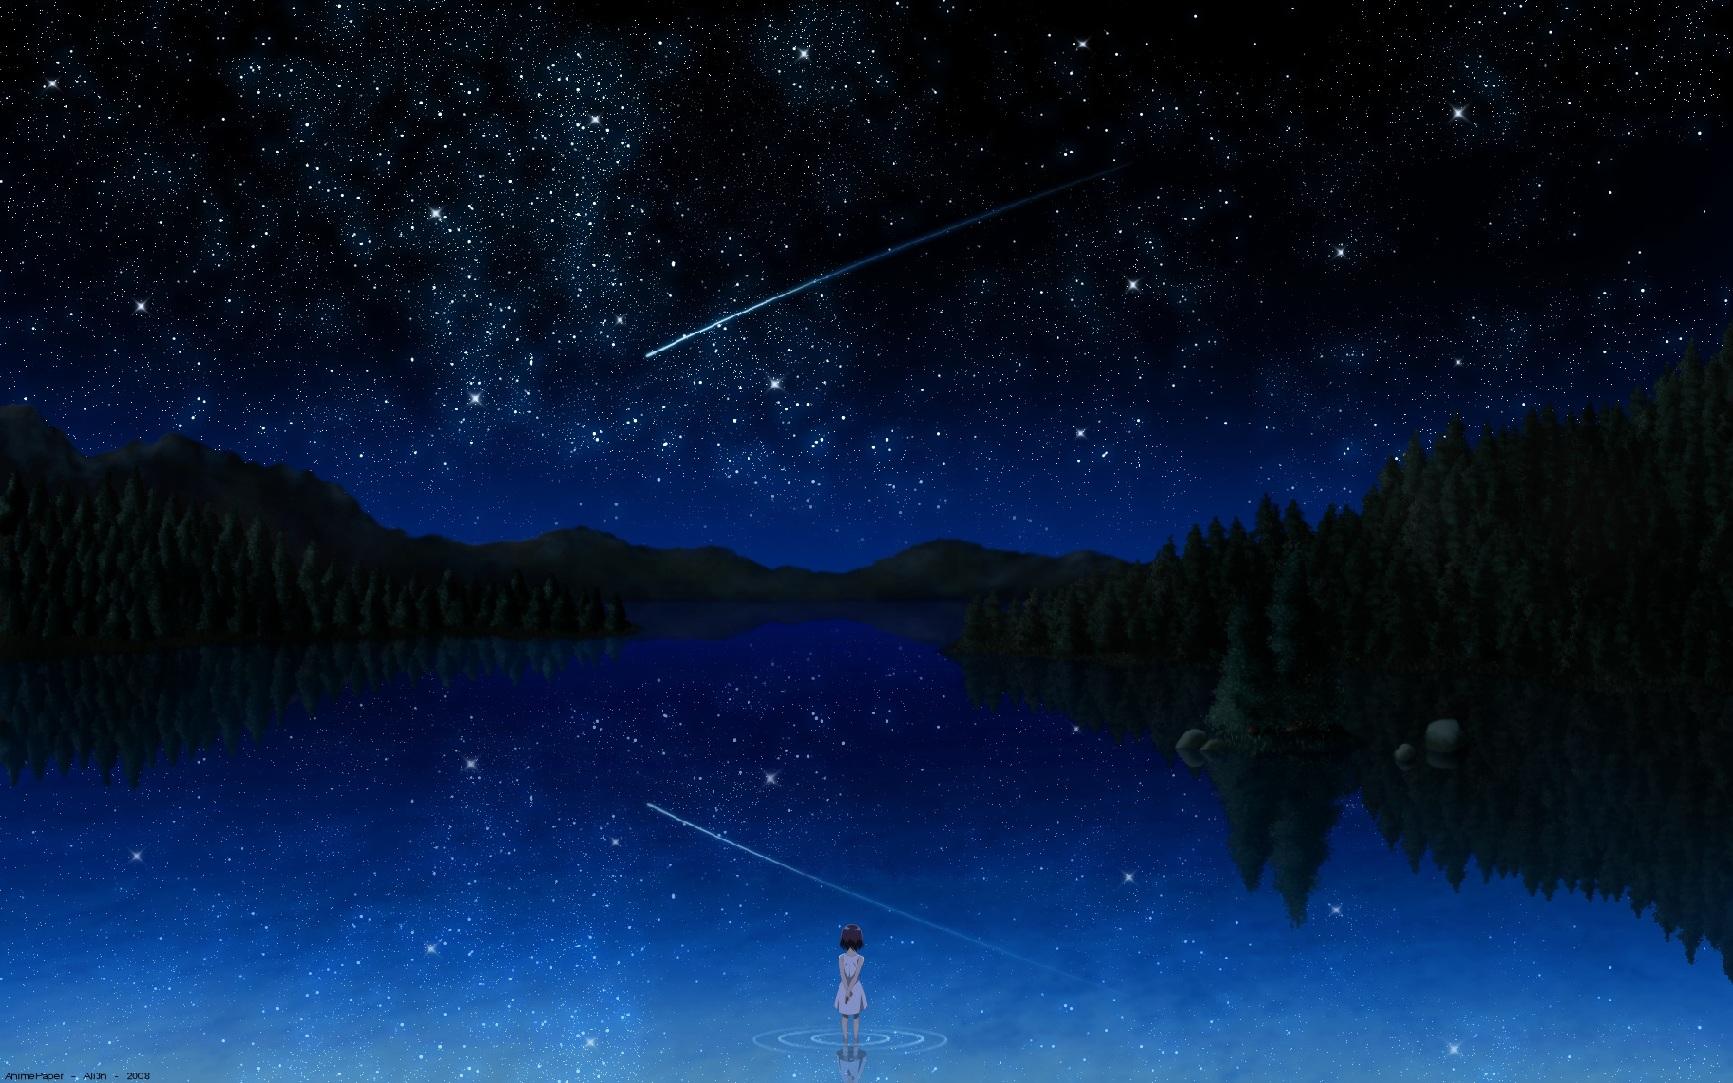 anime-water-nature-anime-girls-shooting-stars.jpg